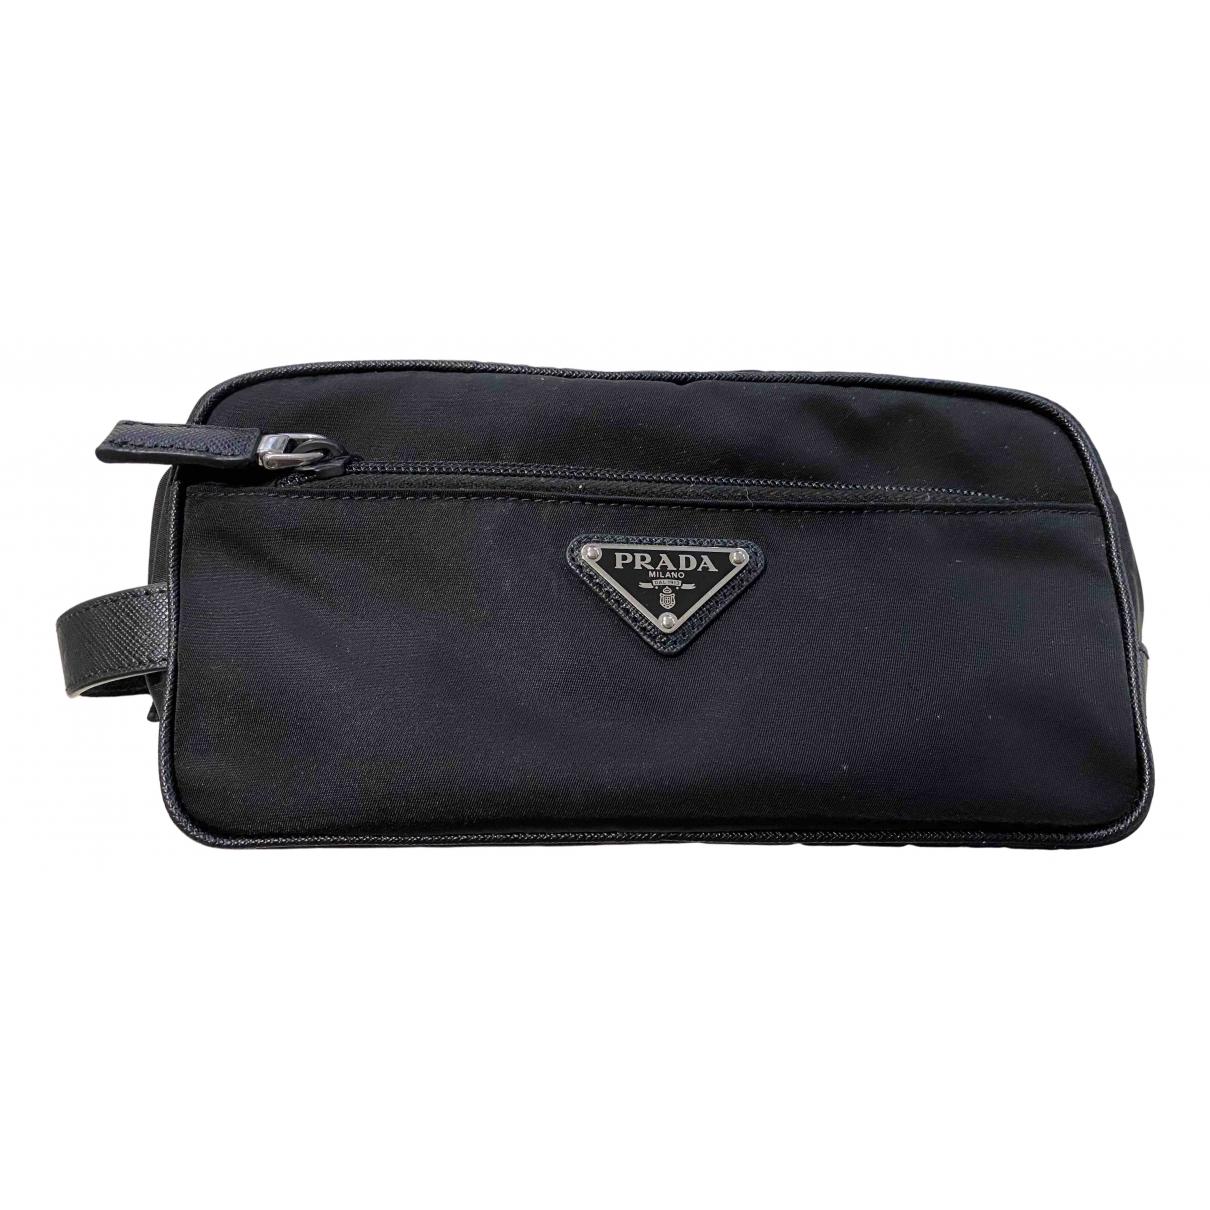 Prada \N Black Small bag, wallet & cases for Men \N